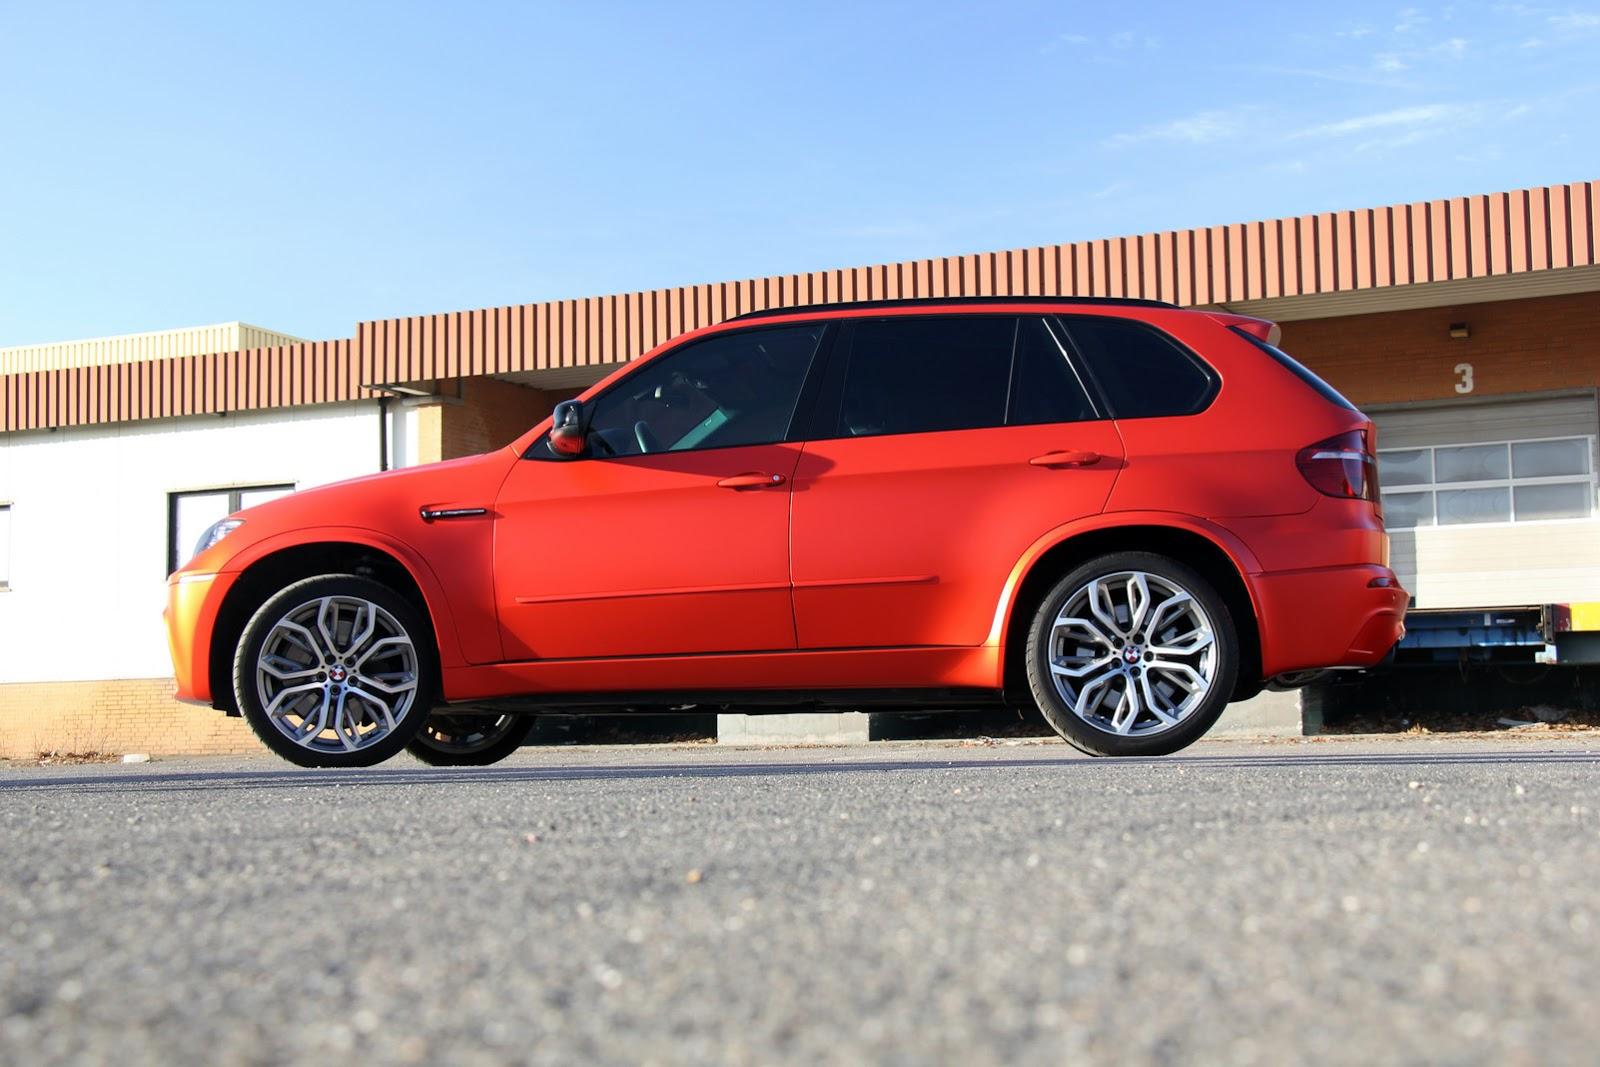 Fostla-BMW-X5-E70-10.jpg